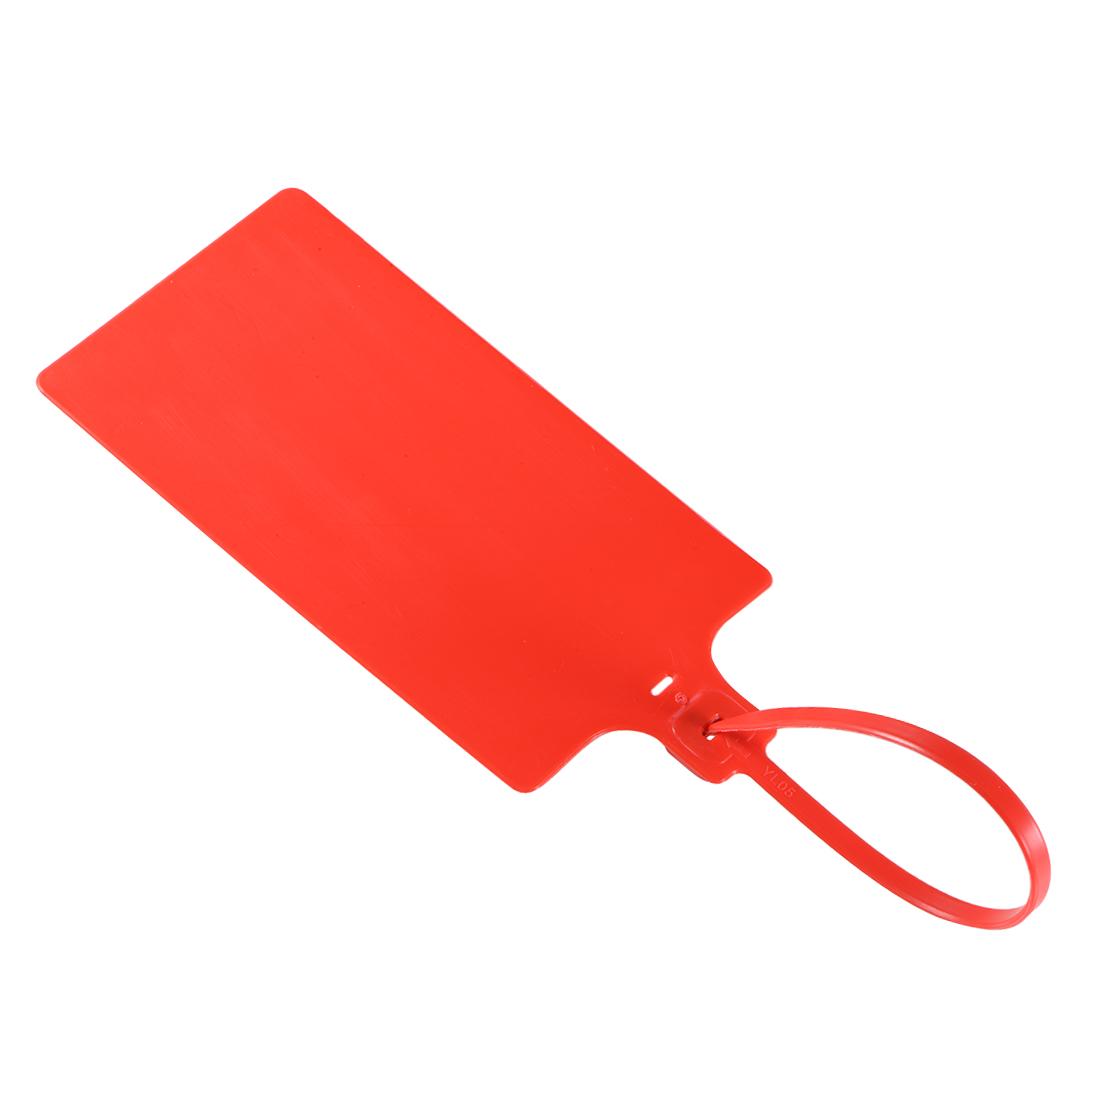 Plastic Zip Ties Seals Anti-Tamper 255mm Length, Red, Pack of 20